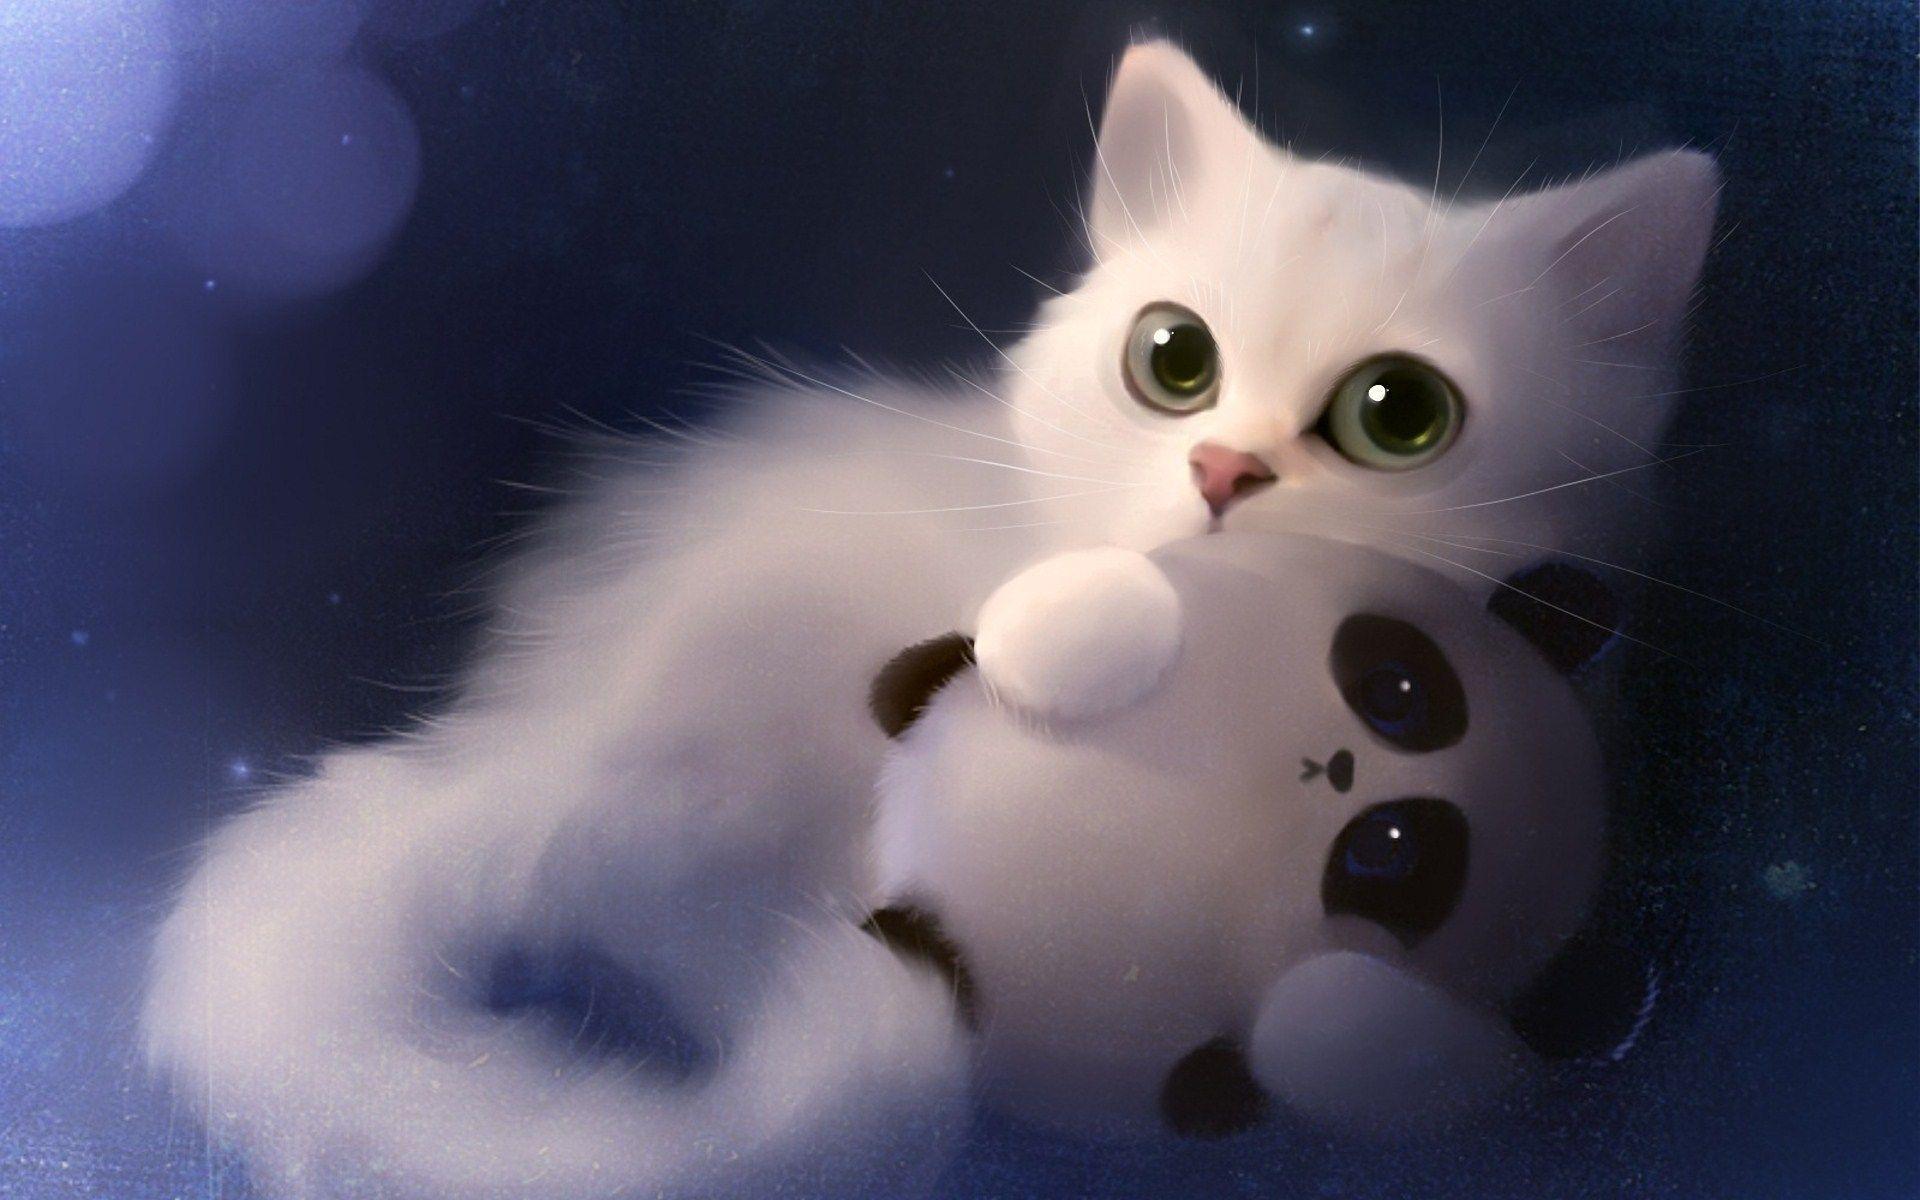 Wallpaper download cute - Cute Wallpapers Hd 1 Ahd Images